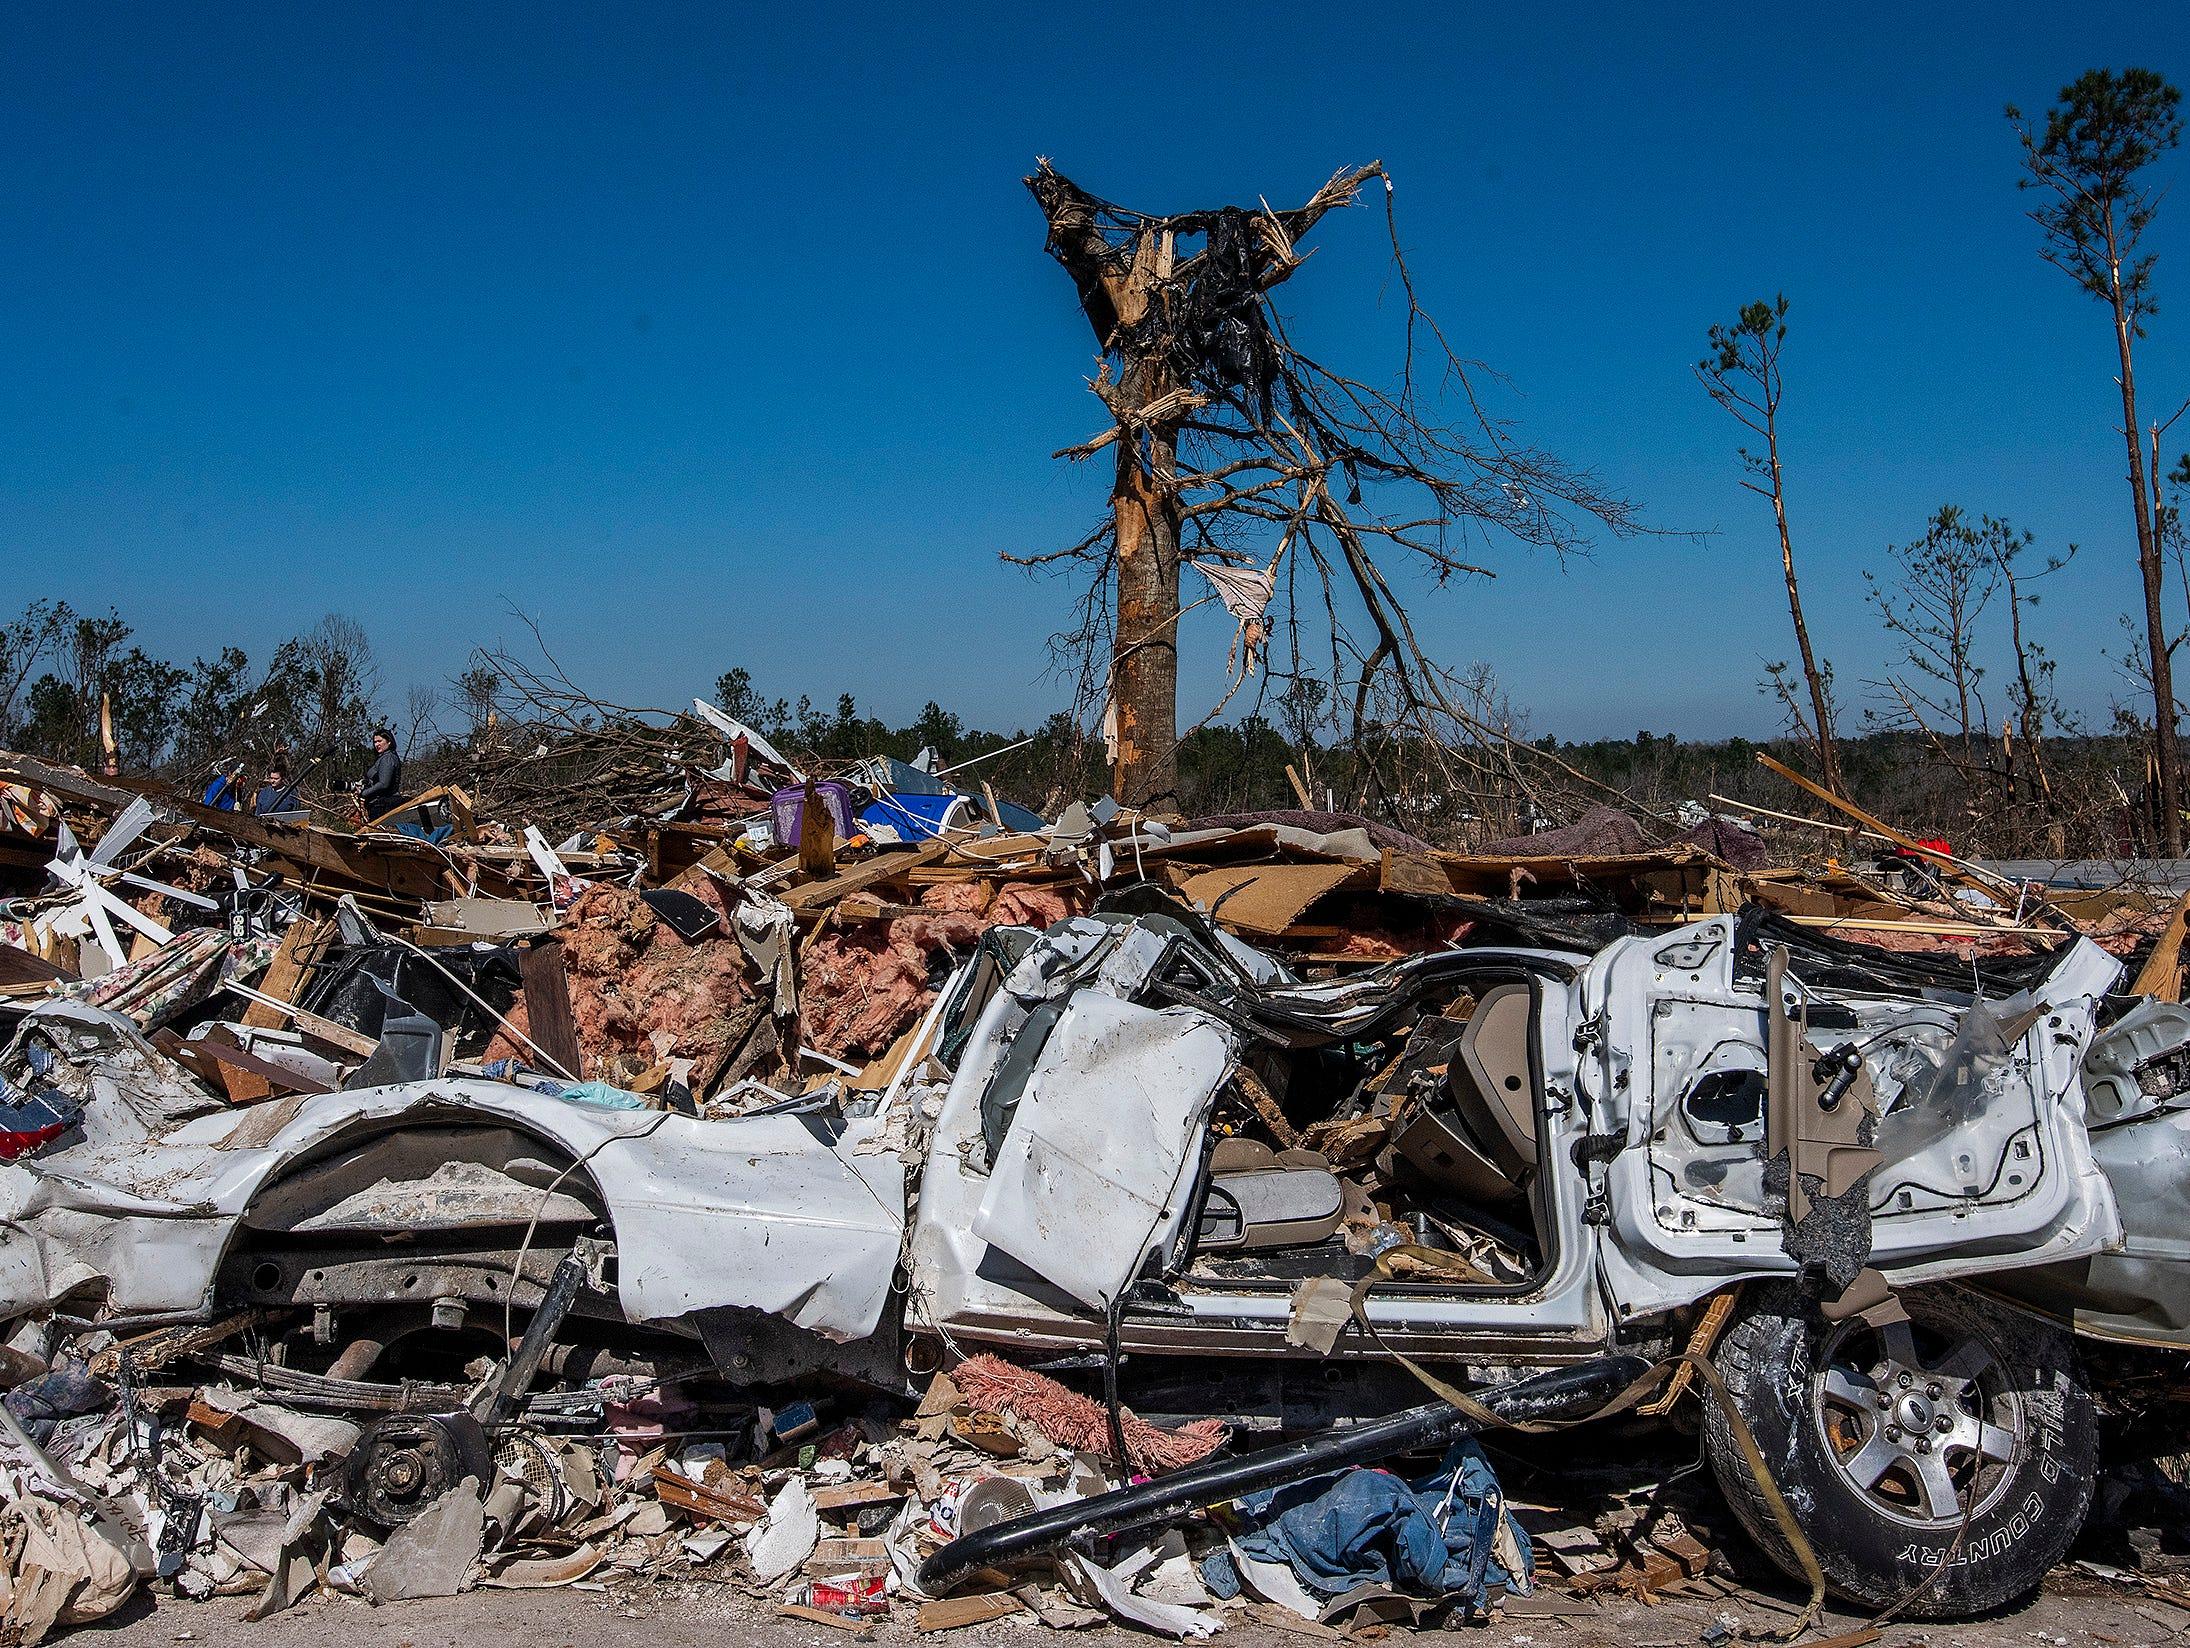 Tornado damage in Beauregard, Ala. on March 6, 2019.